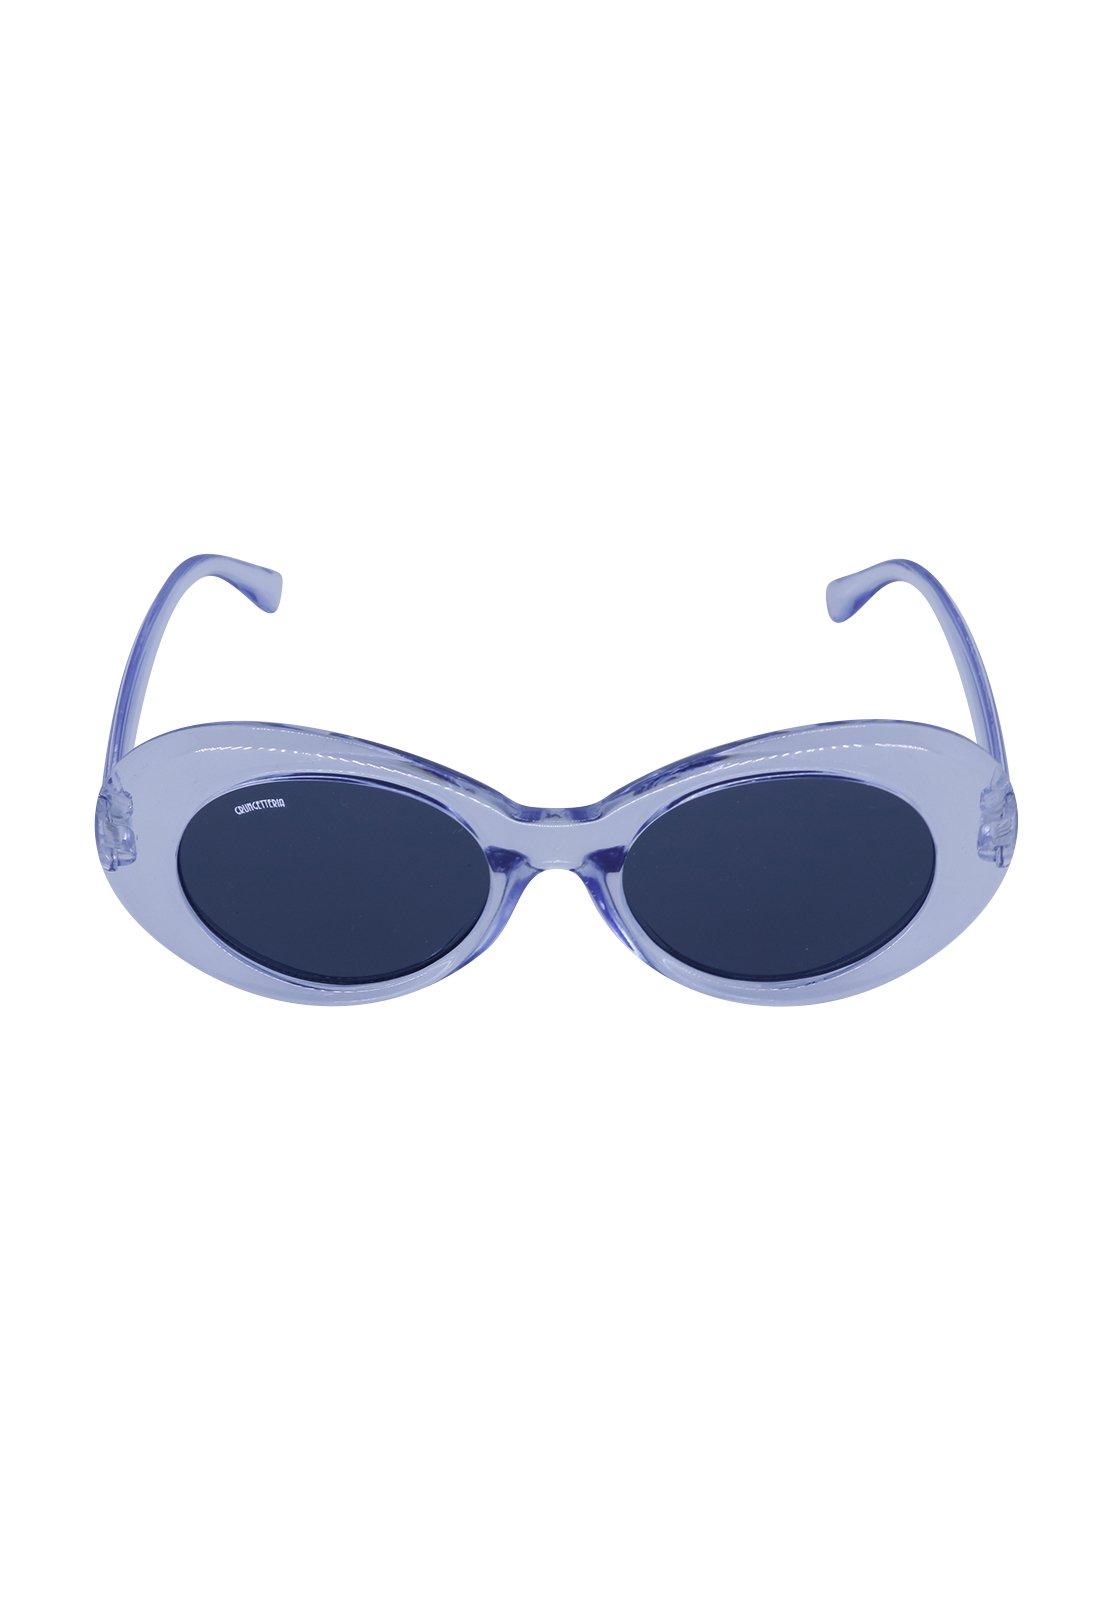 Óculos de Sol Grungetteria Kurt Lua